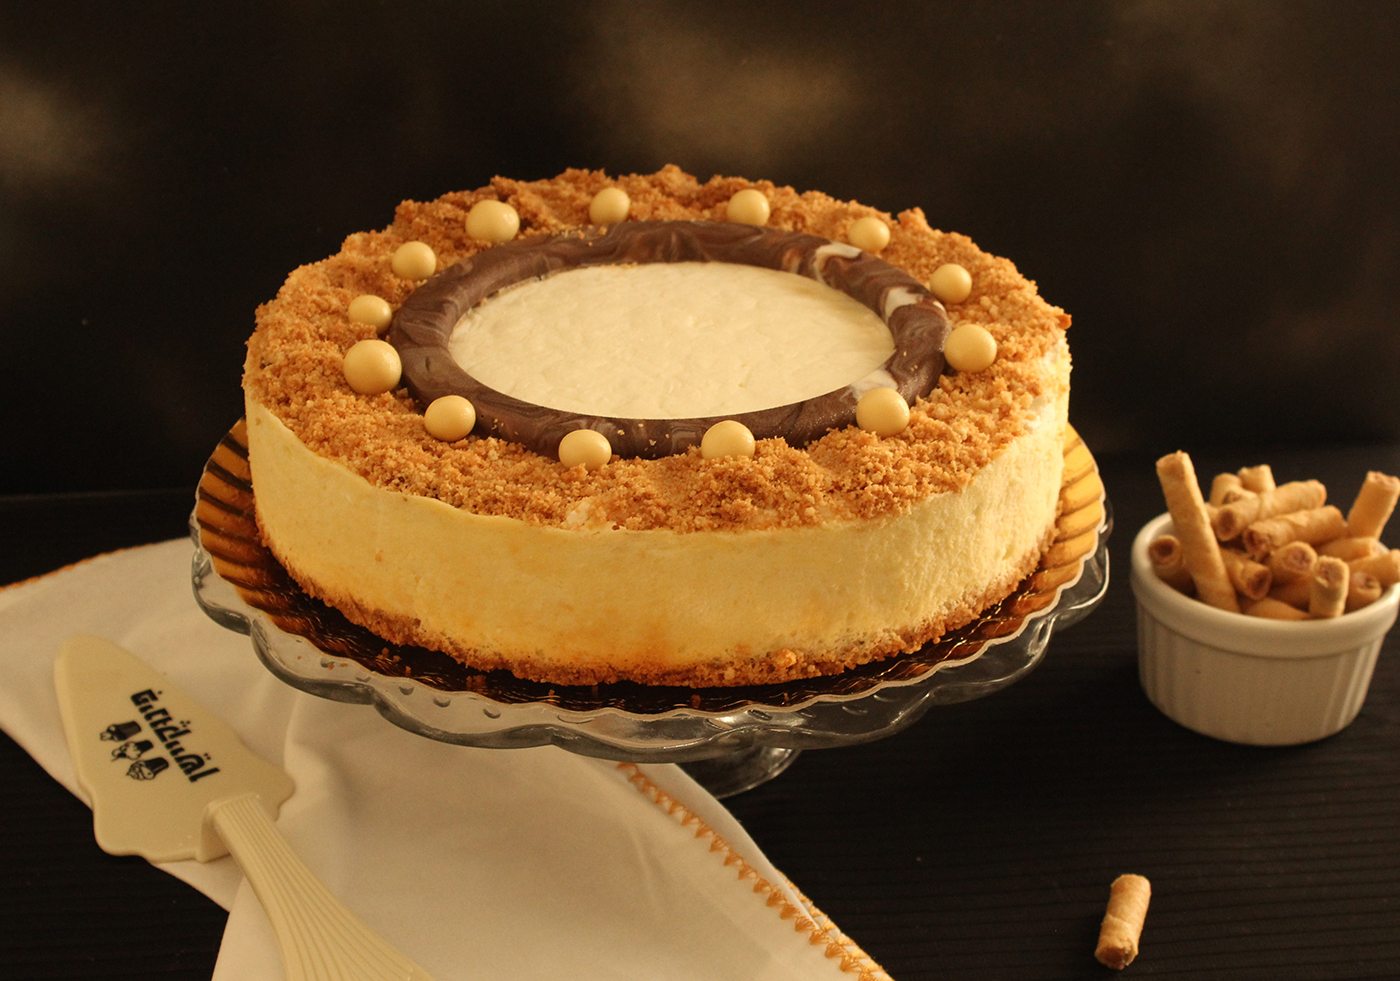 IMG 8275 - עוגת גבינה גבוהה וטעימה